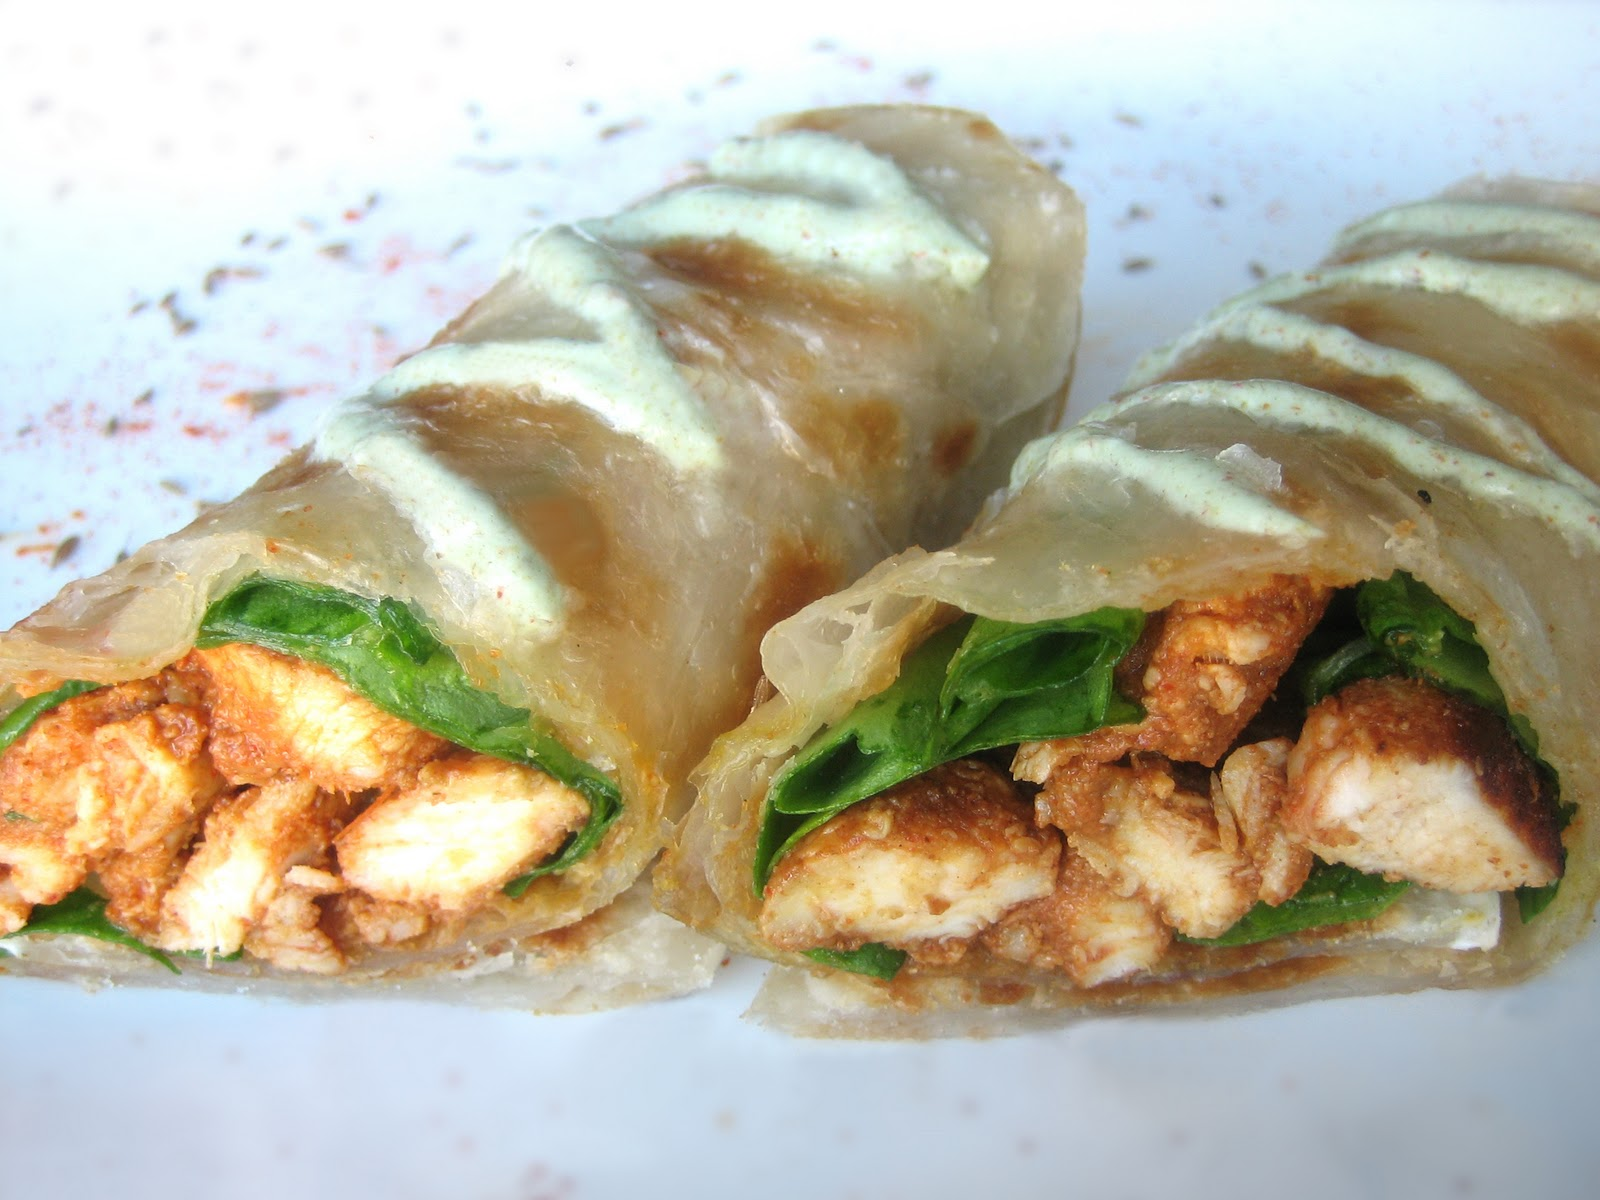 Lawyer Loves Lunch: WDWW: Chicken Tikka Wraps